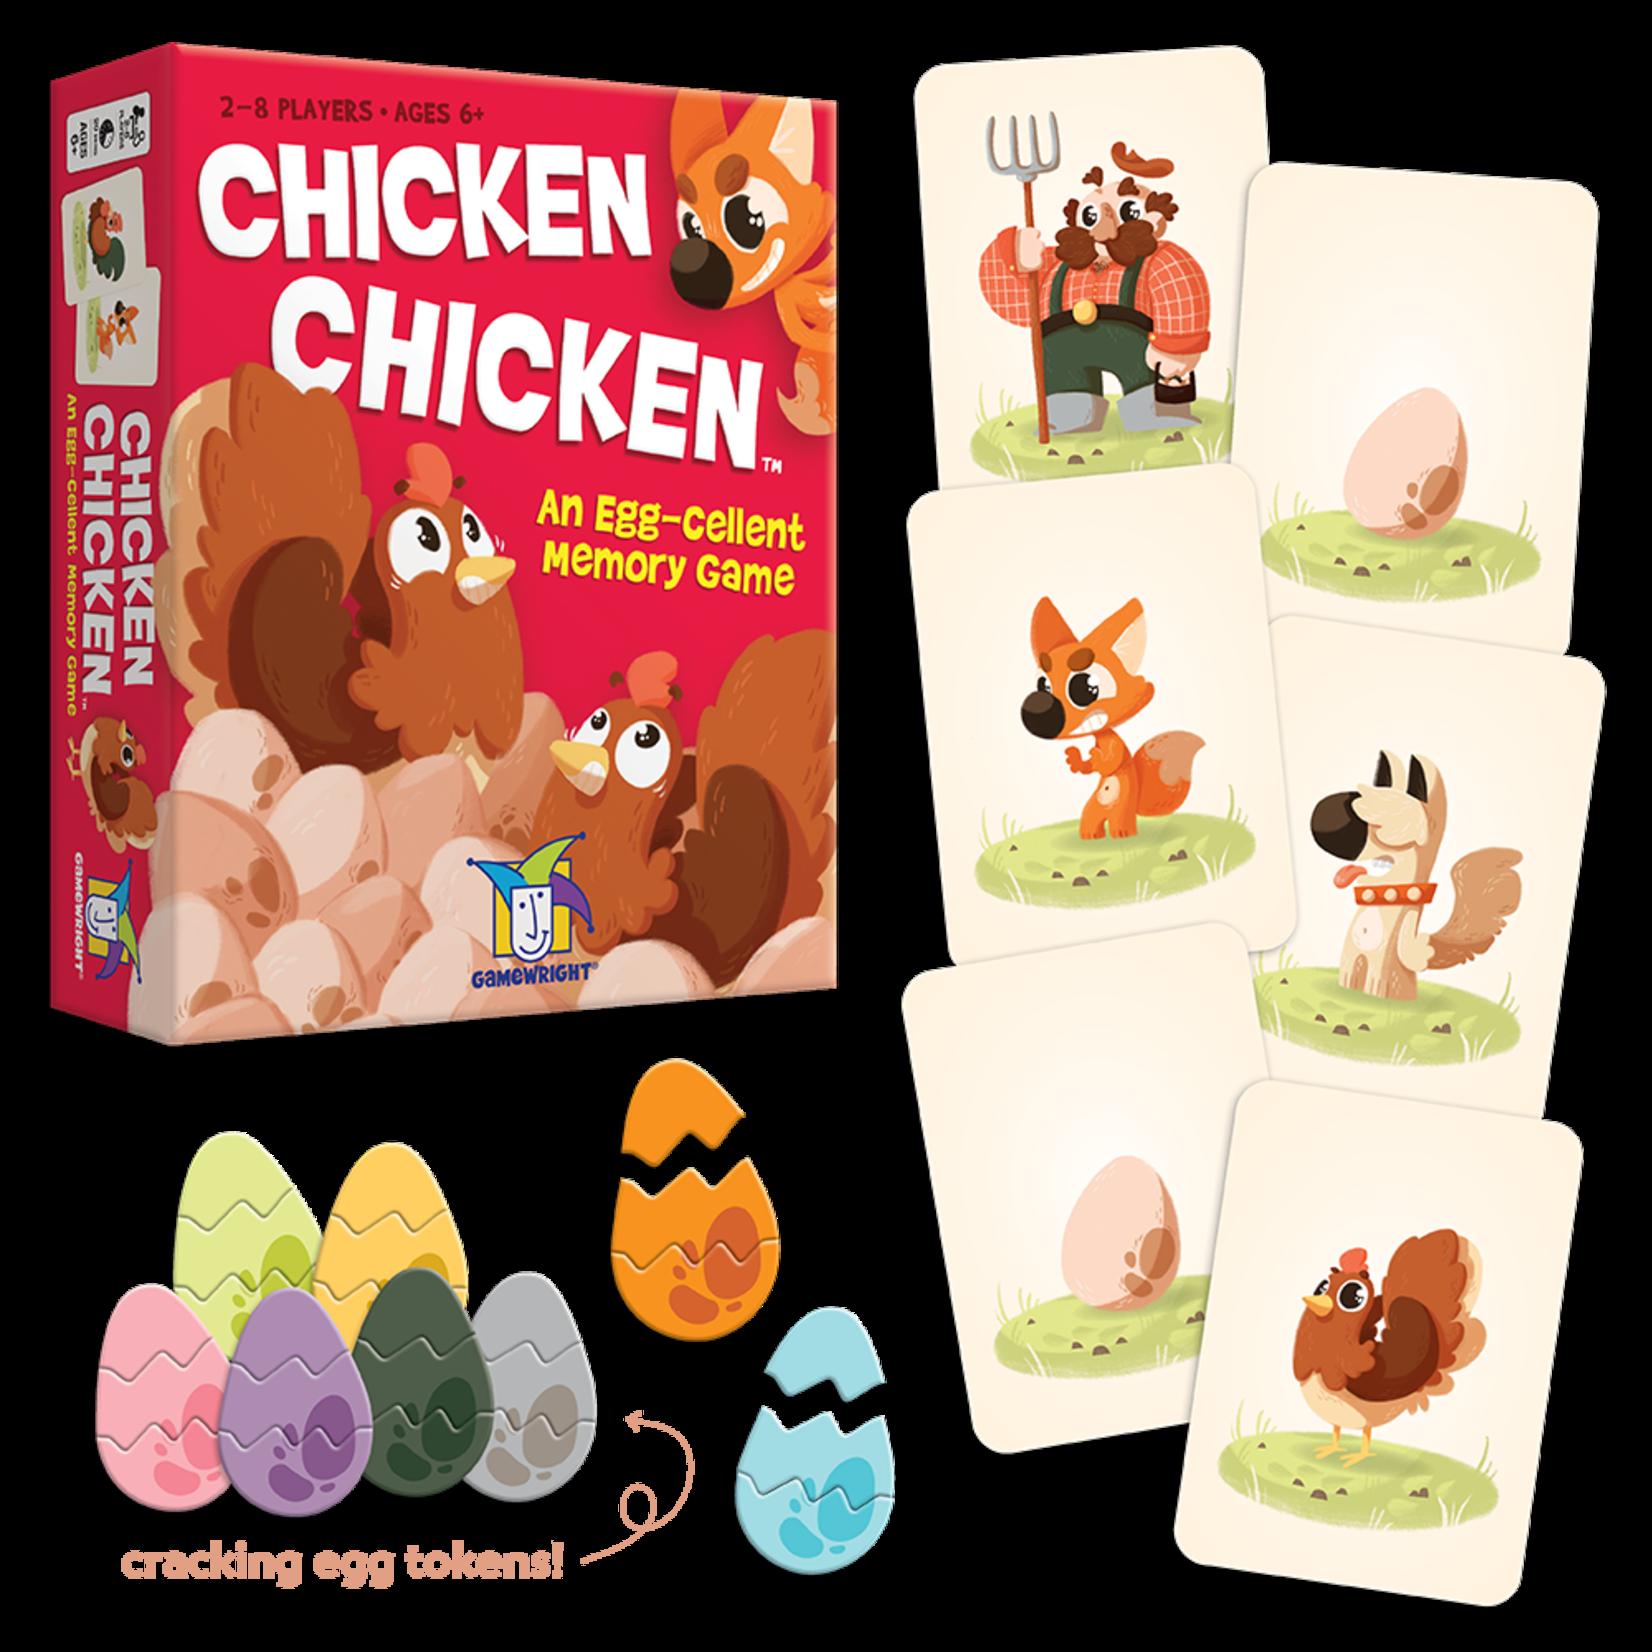 Gamewright Chicken Chicken: An Egg-cellent Memory Game